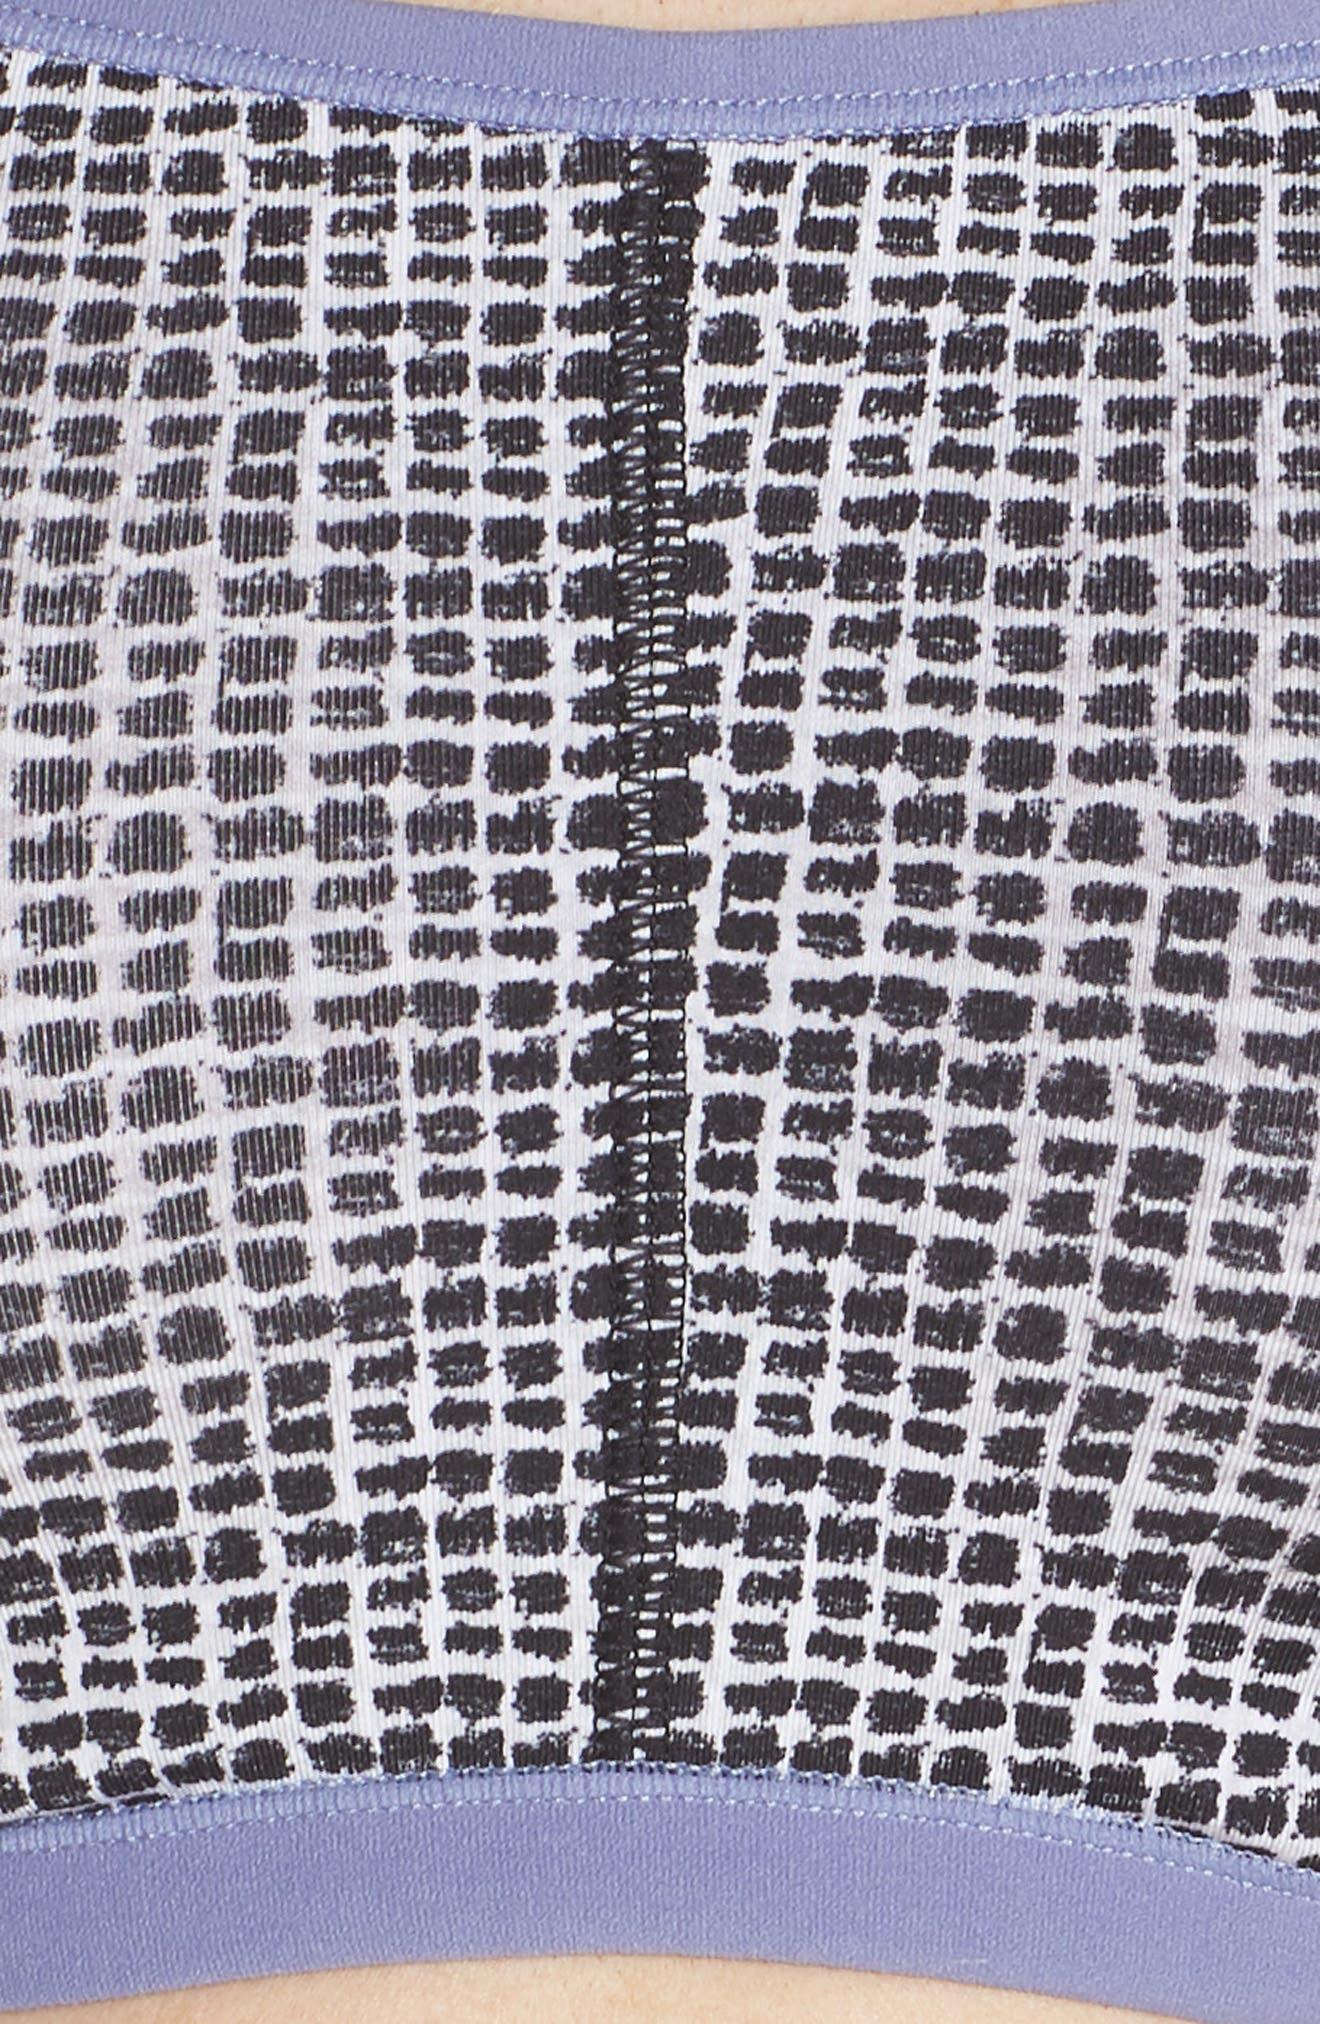 'Yogi' Convertible Bra,                             Alternate thumbnail 7, color,                             Black Rattan Print/ Chambray